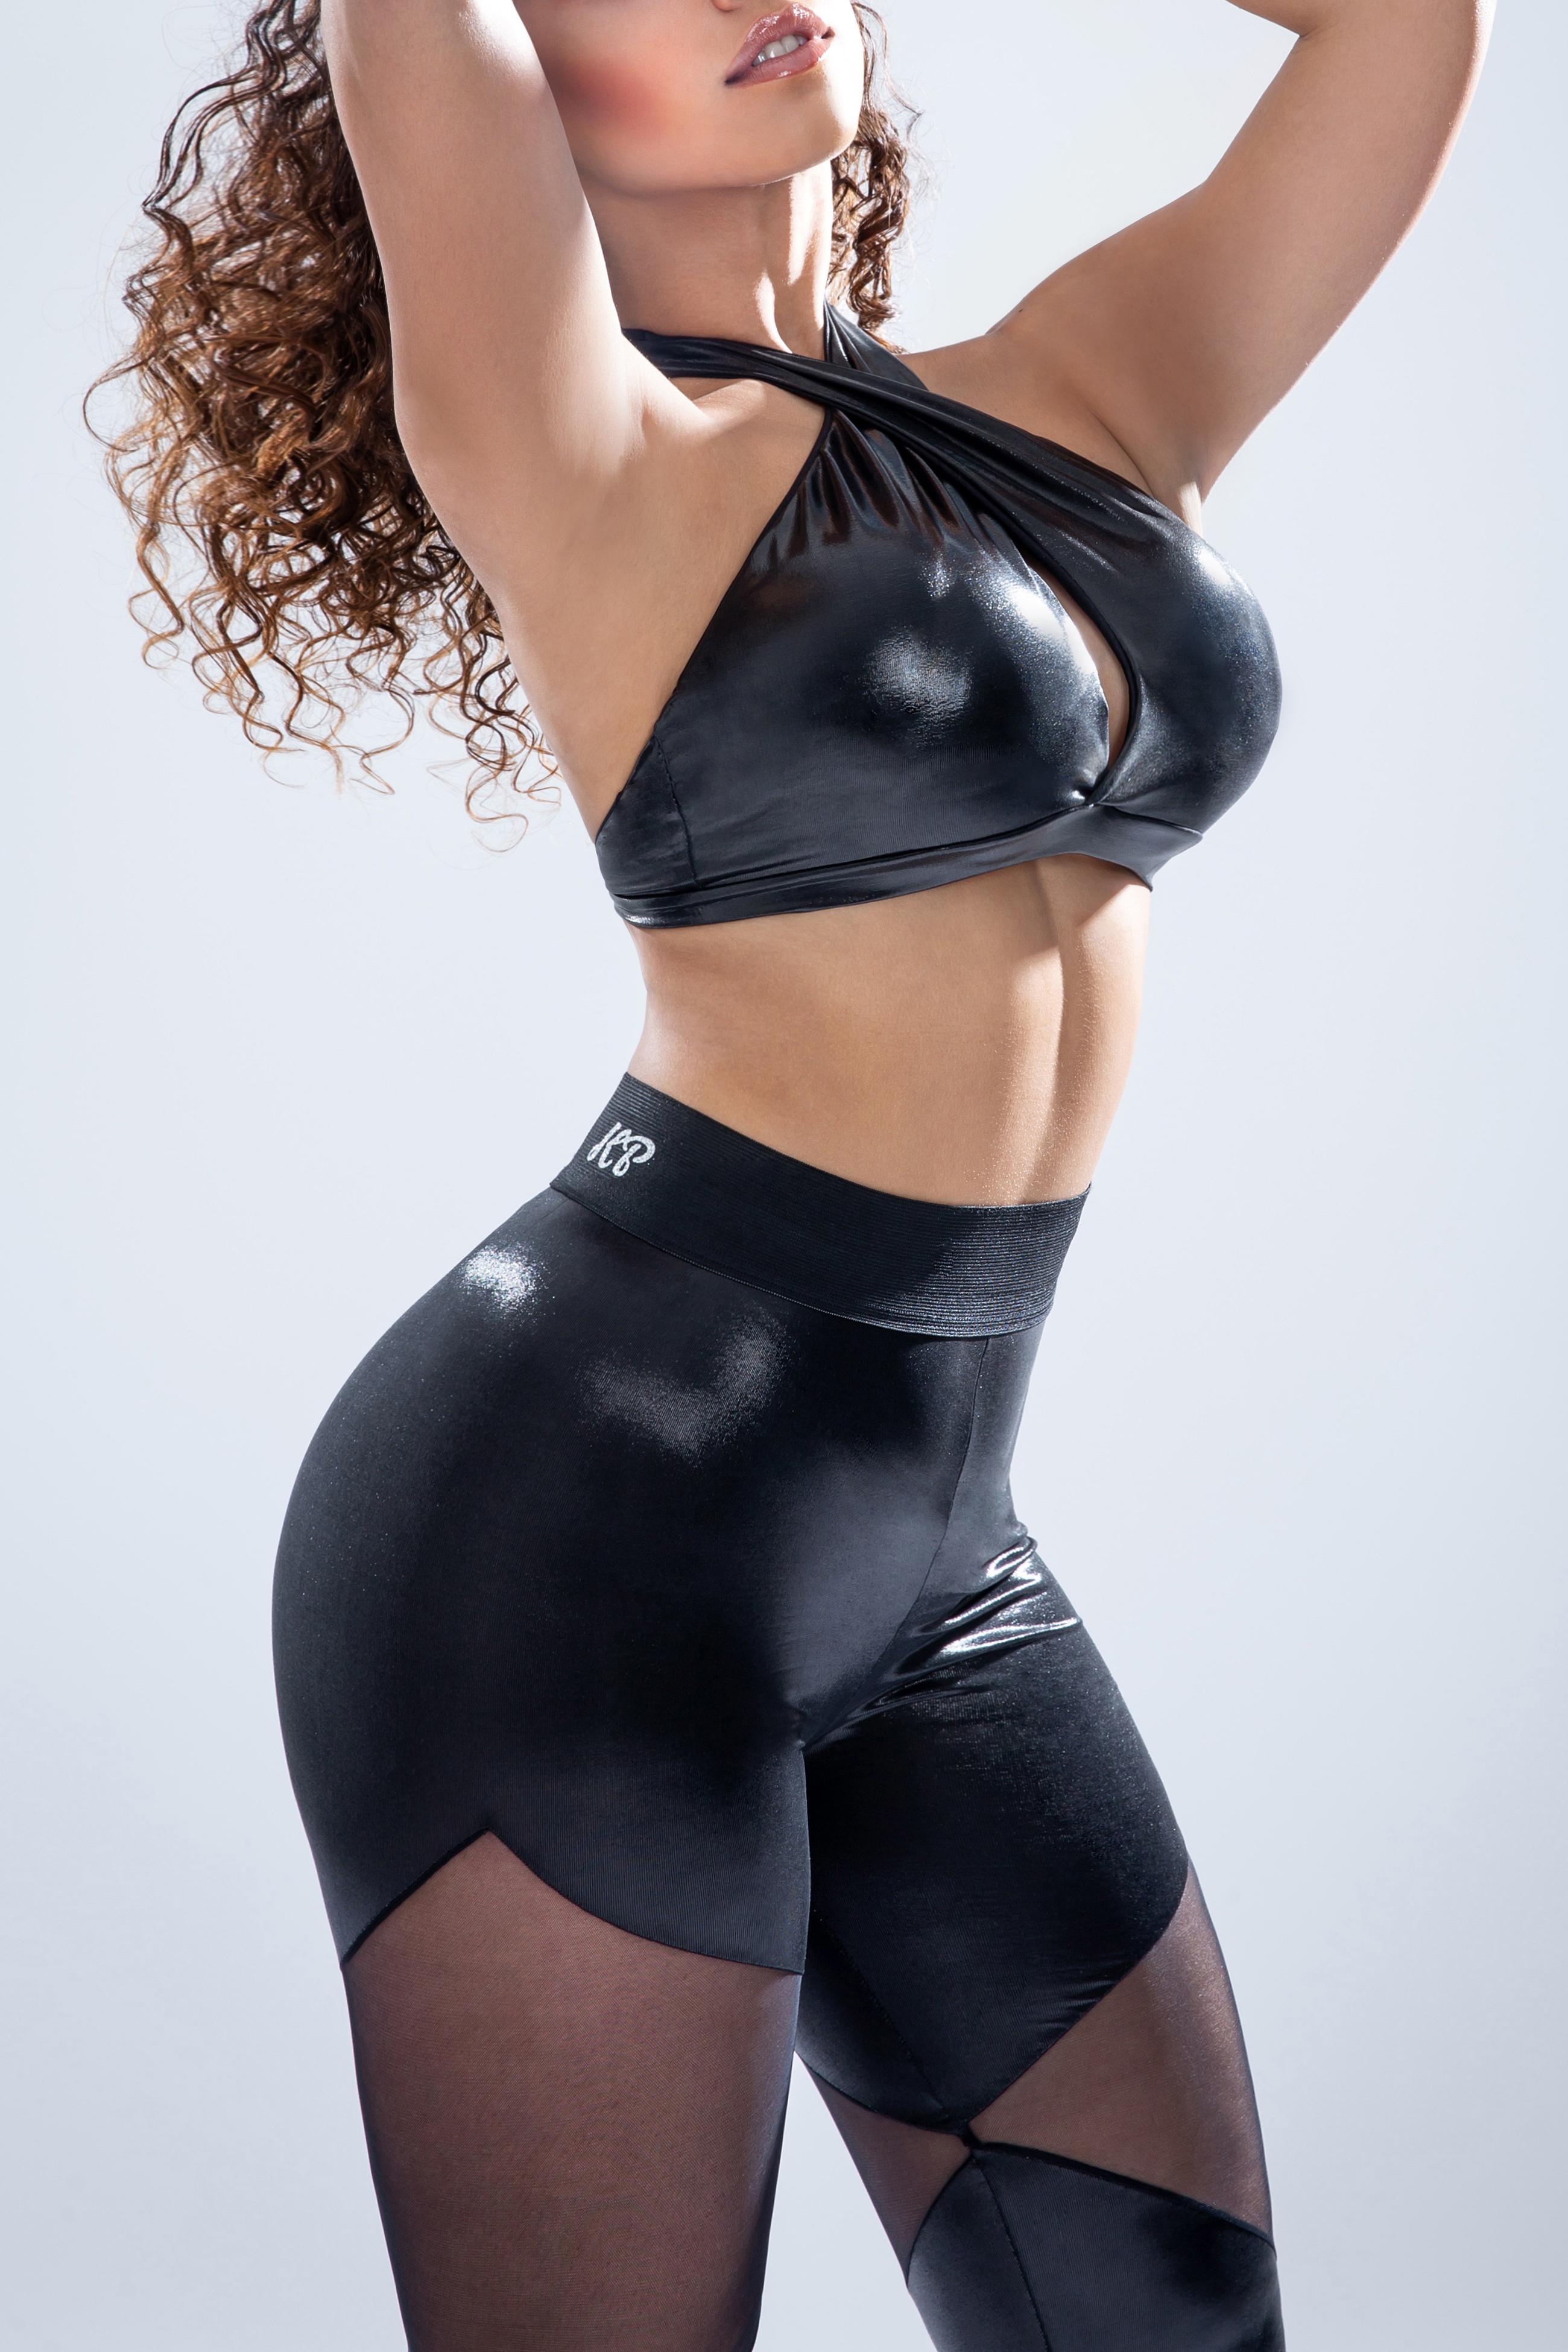 KP Dancer top with leggins C_KP_F_19_07_black